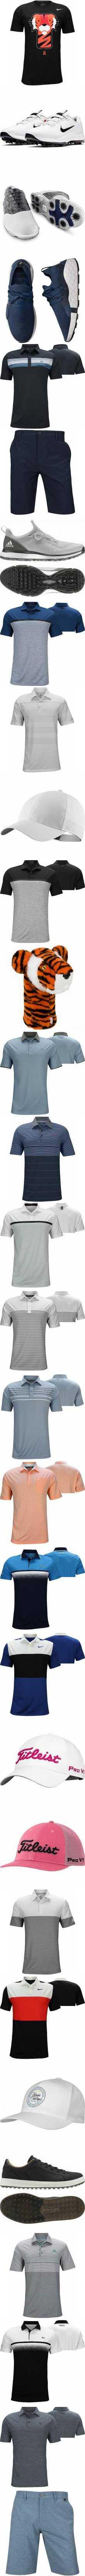 59978289 Adidas Ultimate Engineered Stripe Golf Shirts - Crystal White